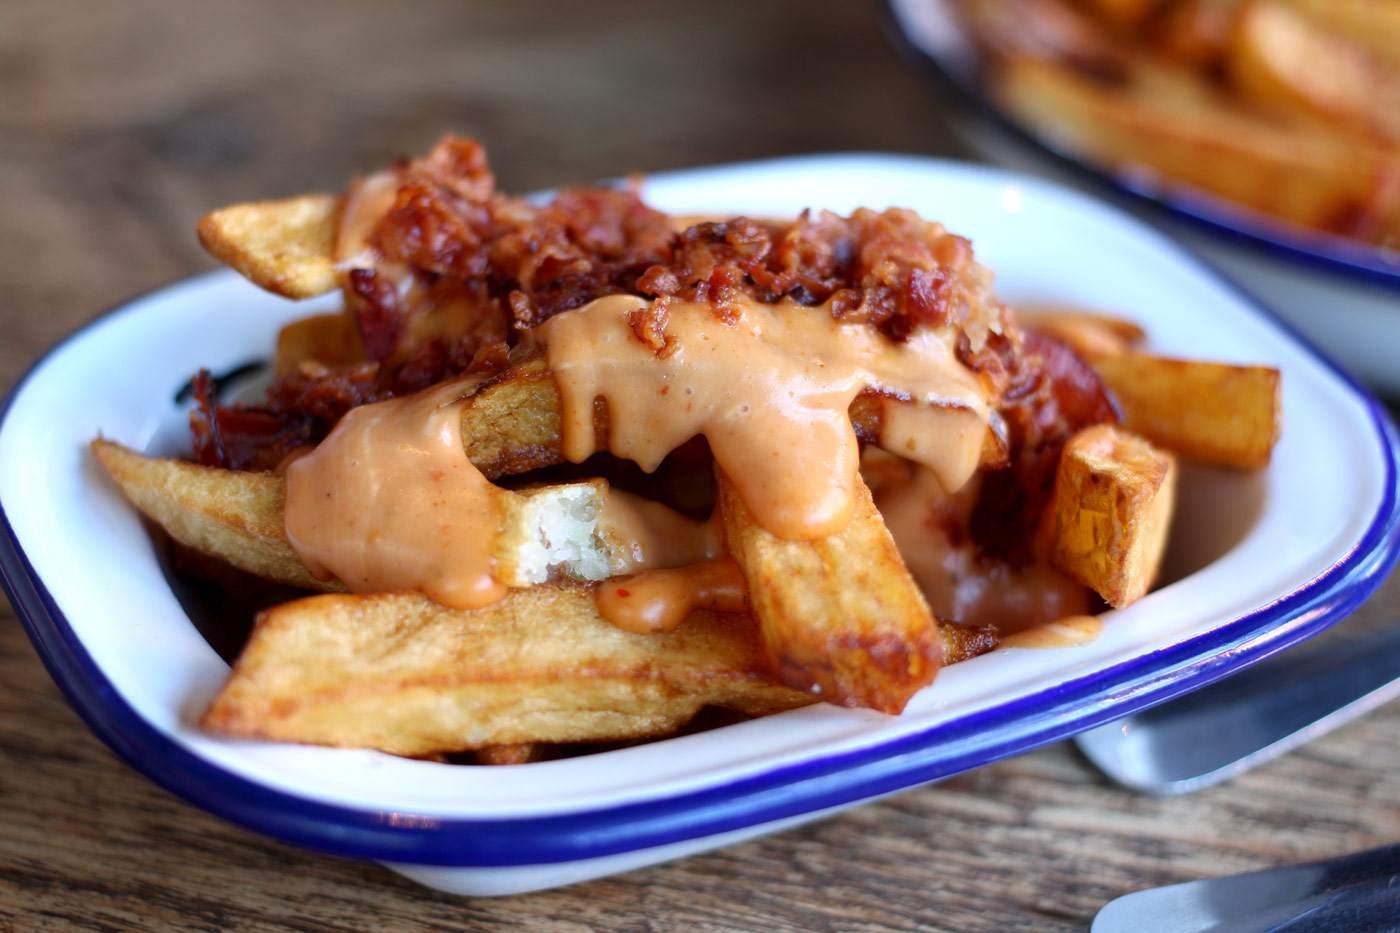 fat-hippo-jesmond-newcastle-review-burger-restaurant-1